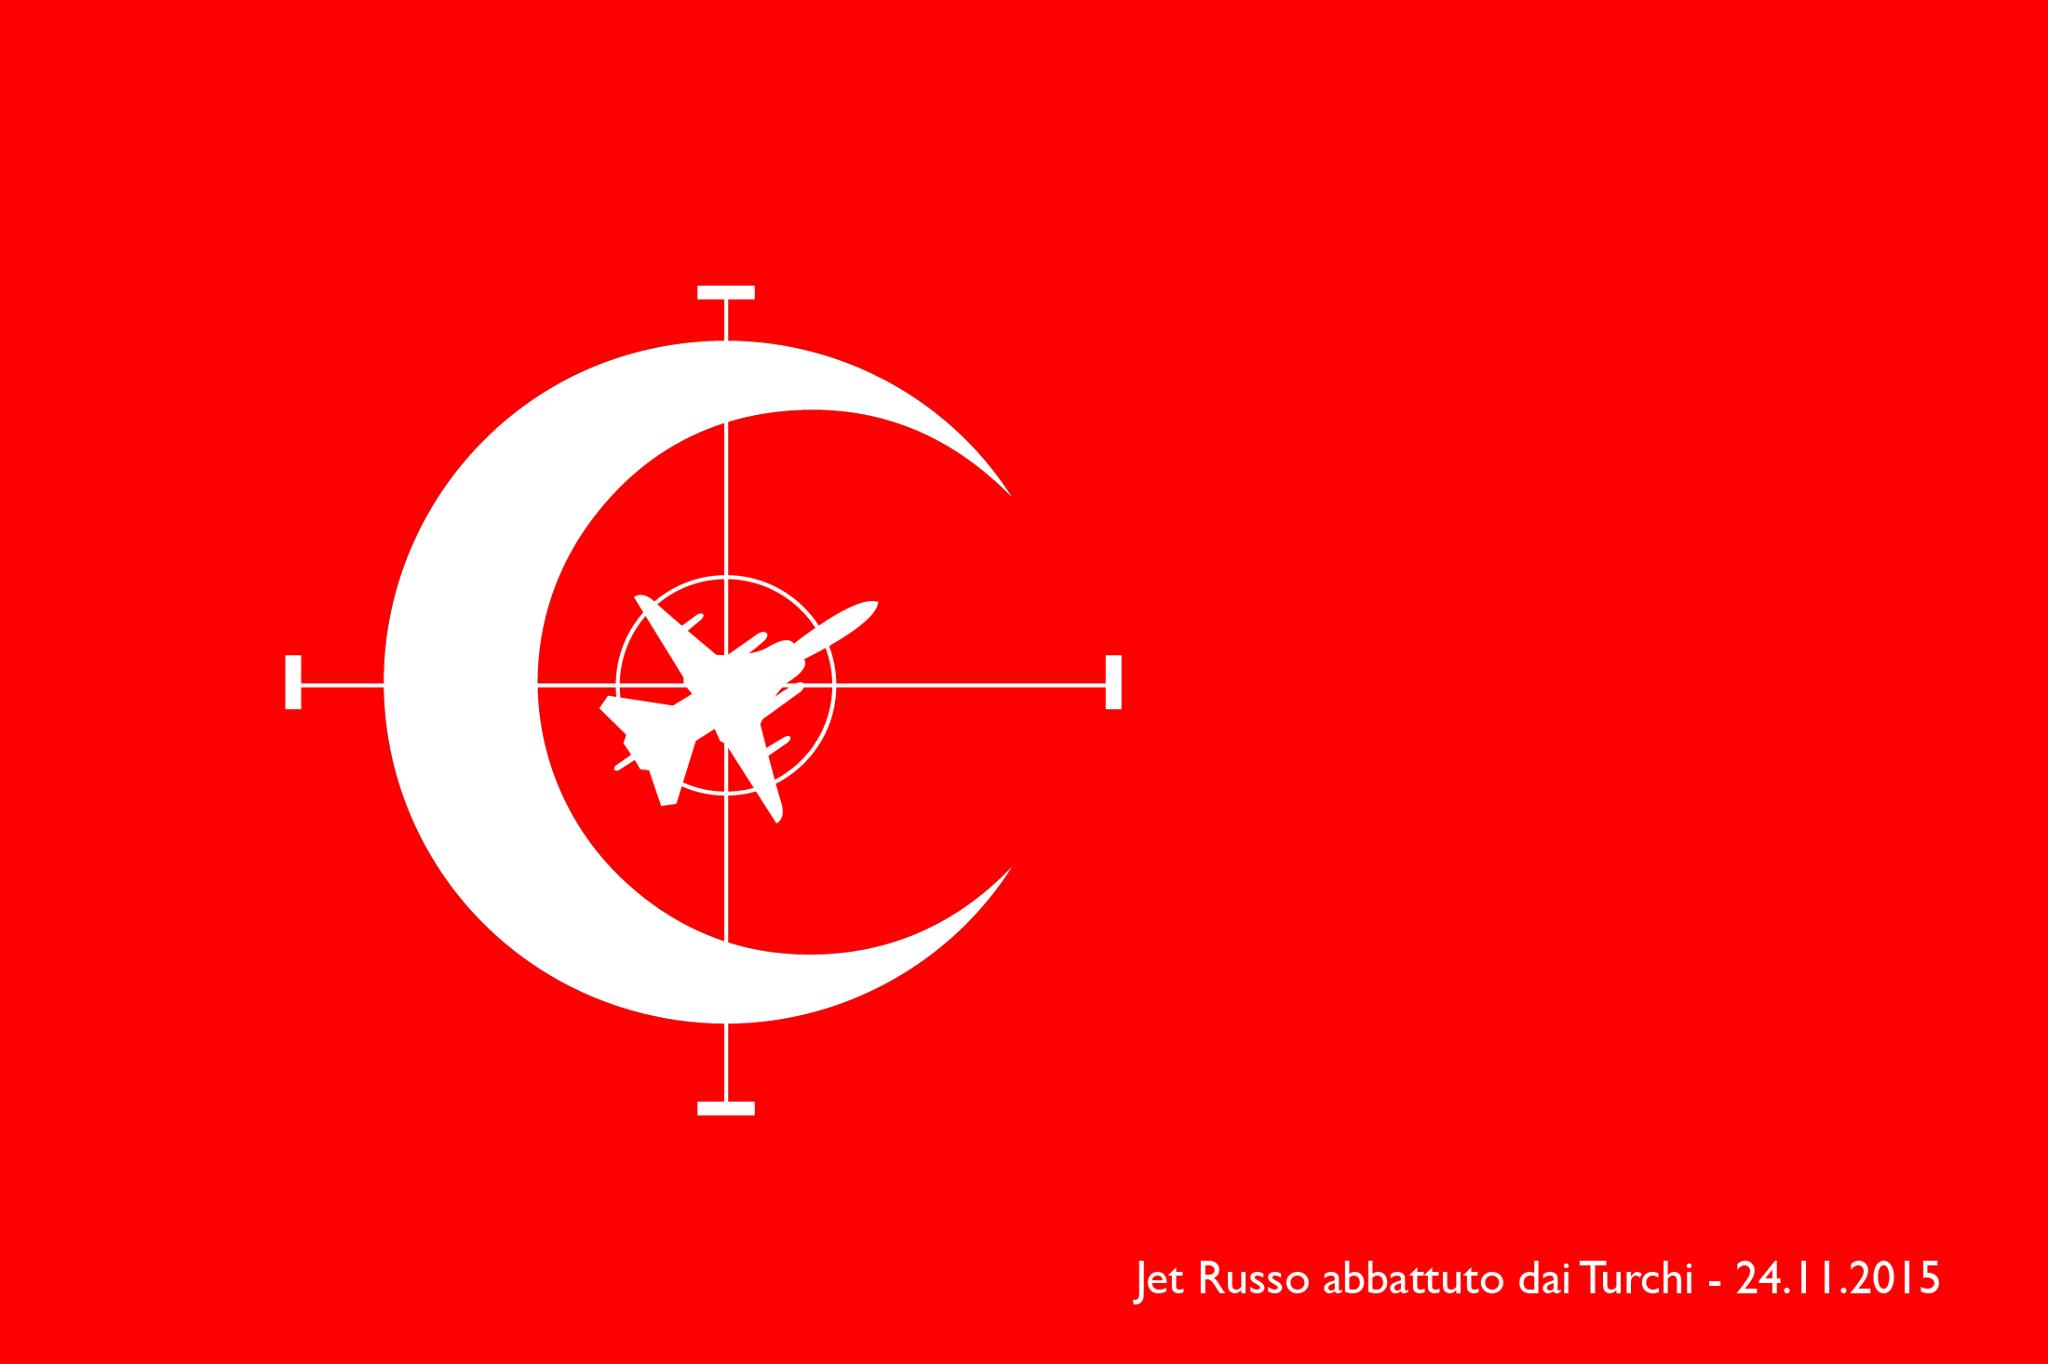 turkish-flag-perseodesign